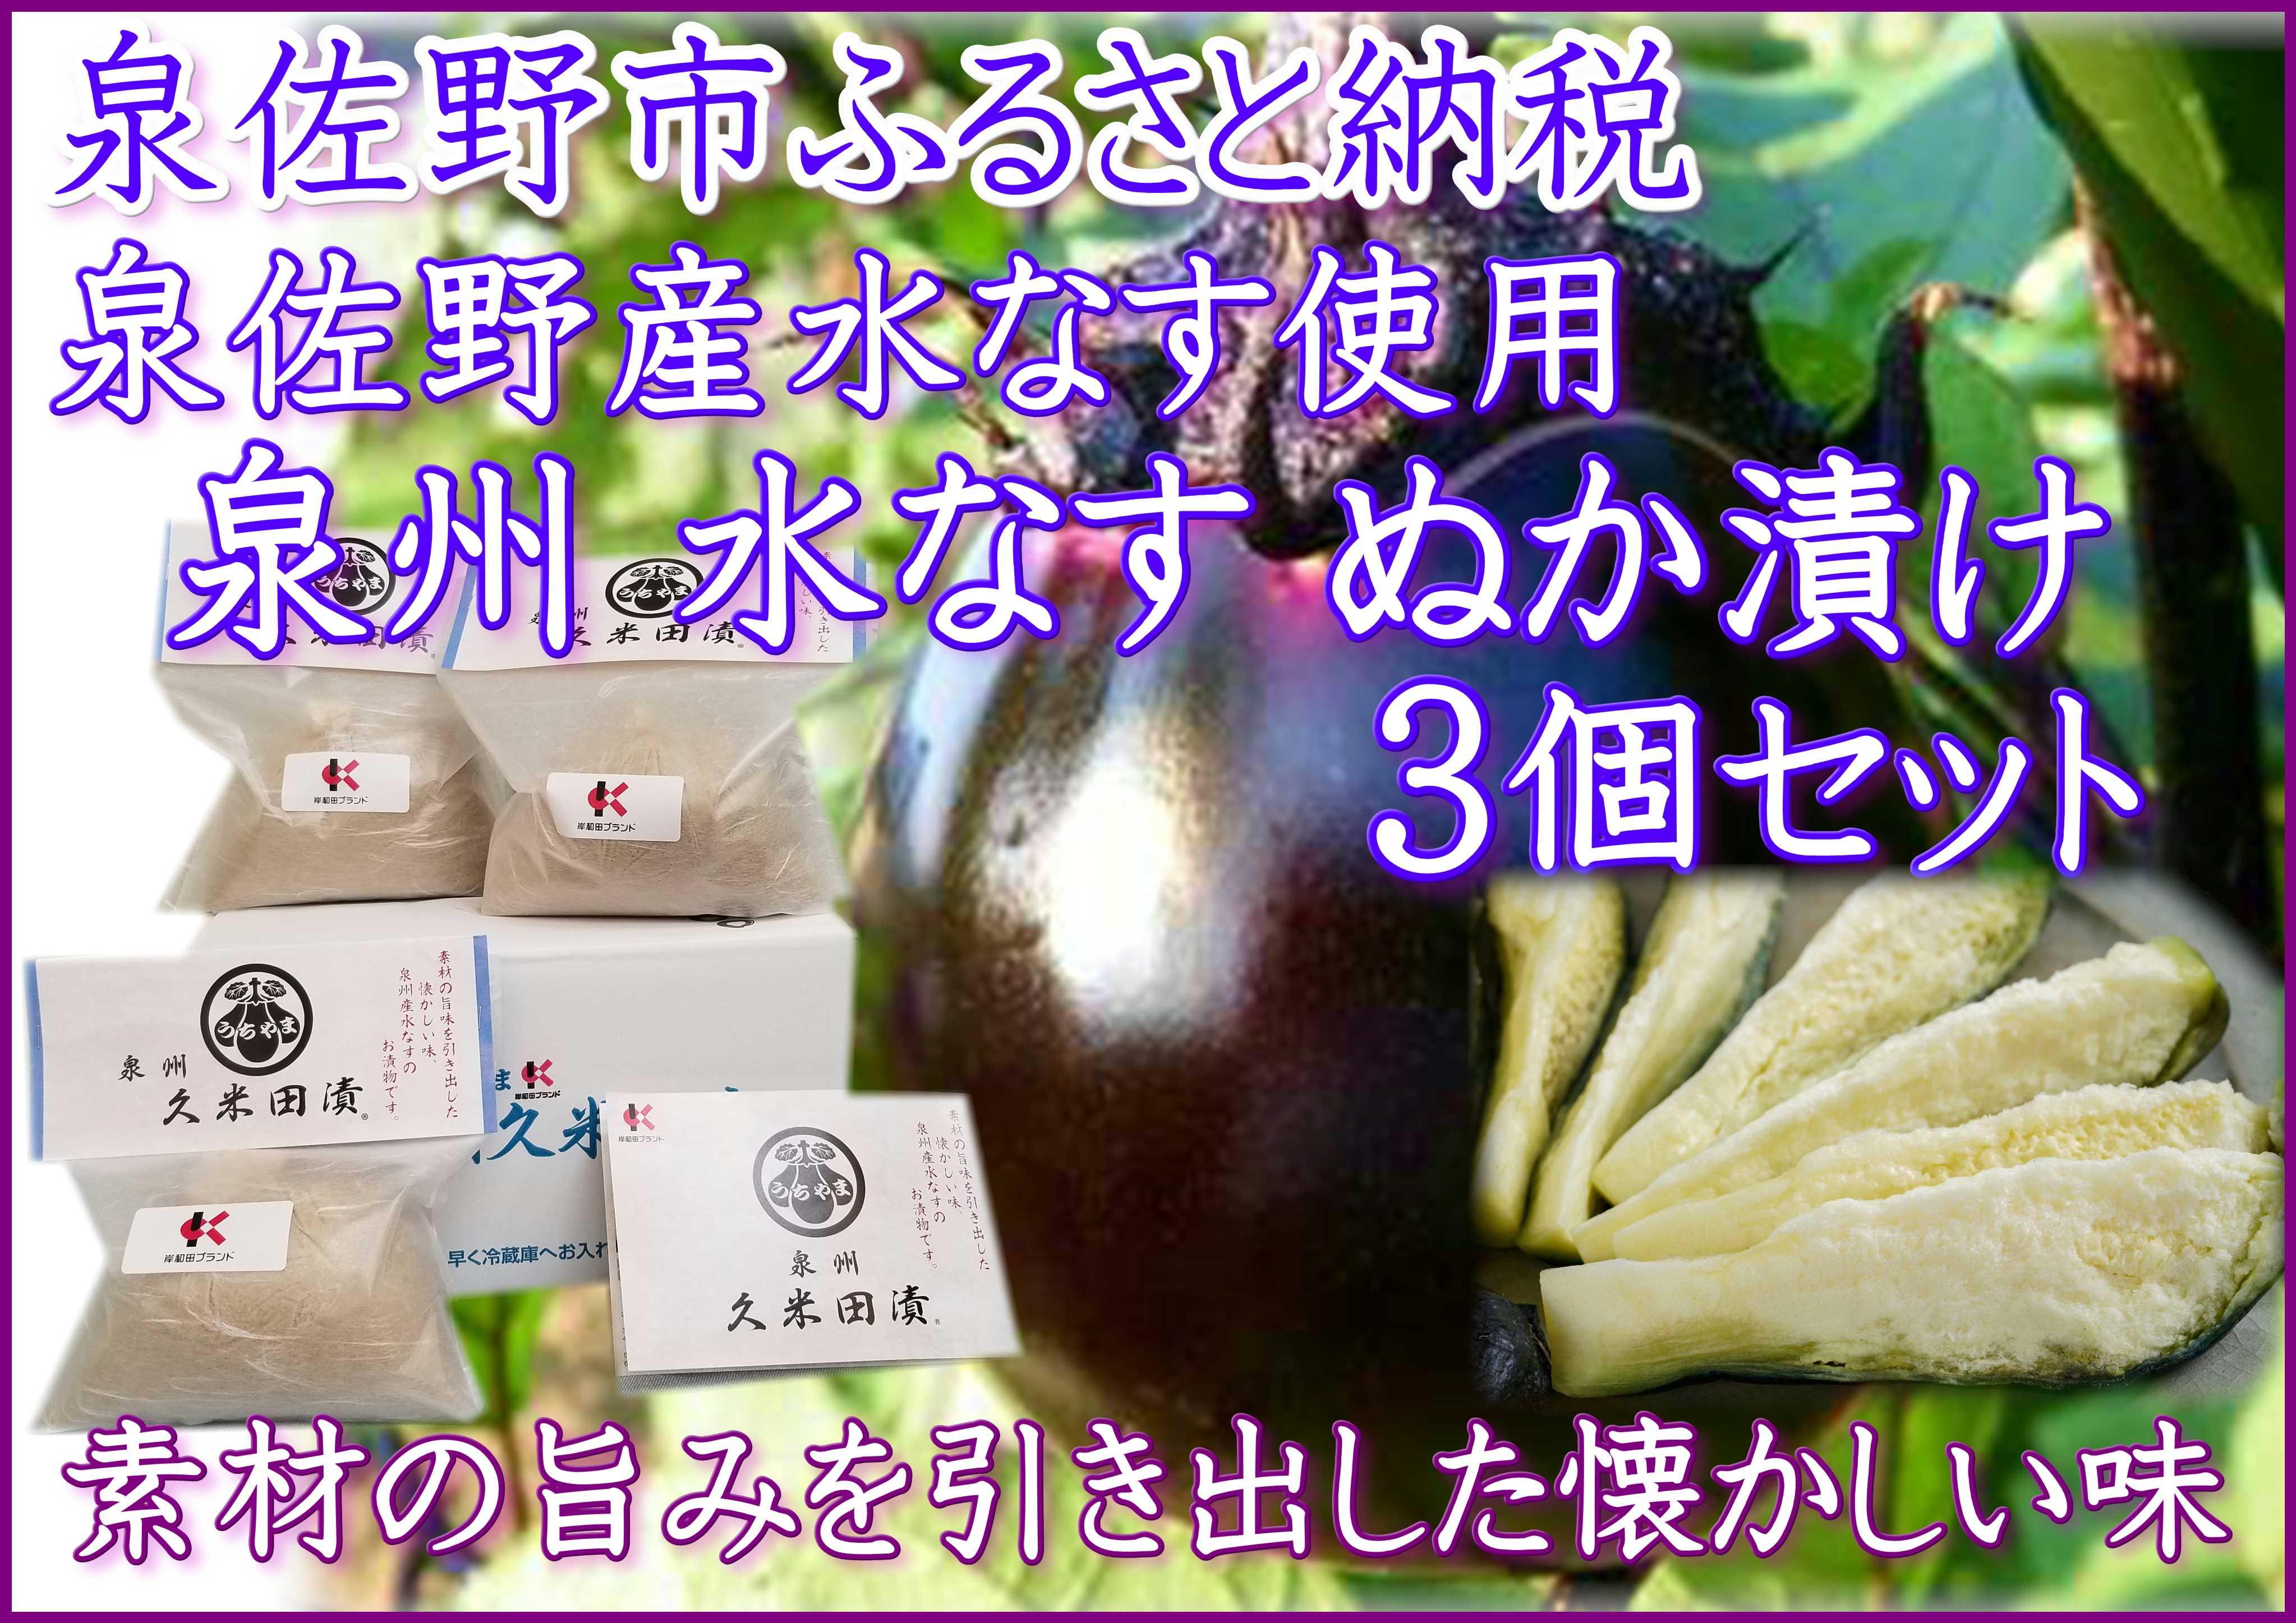 005A194 水なすぬか漬け「泉州久米田漬け」(3個)